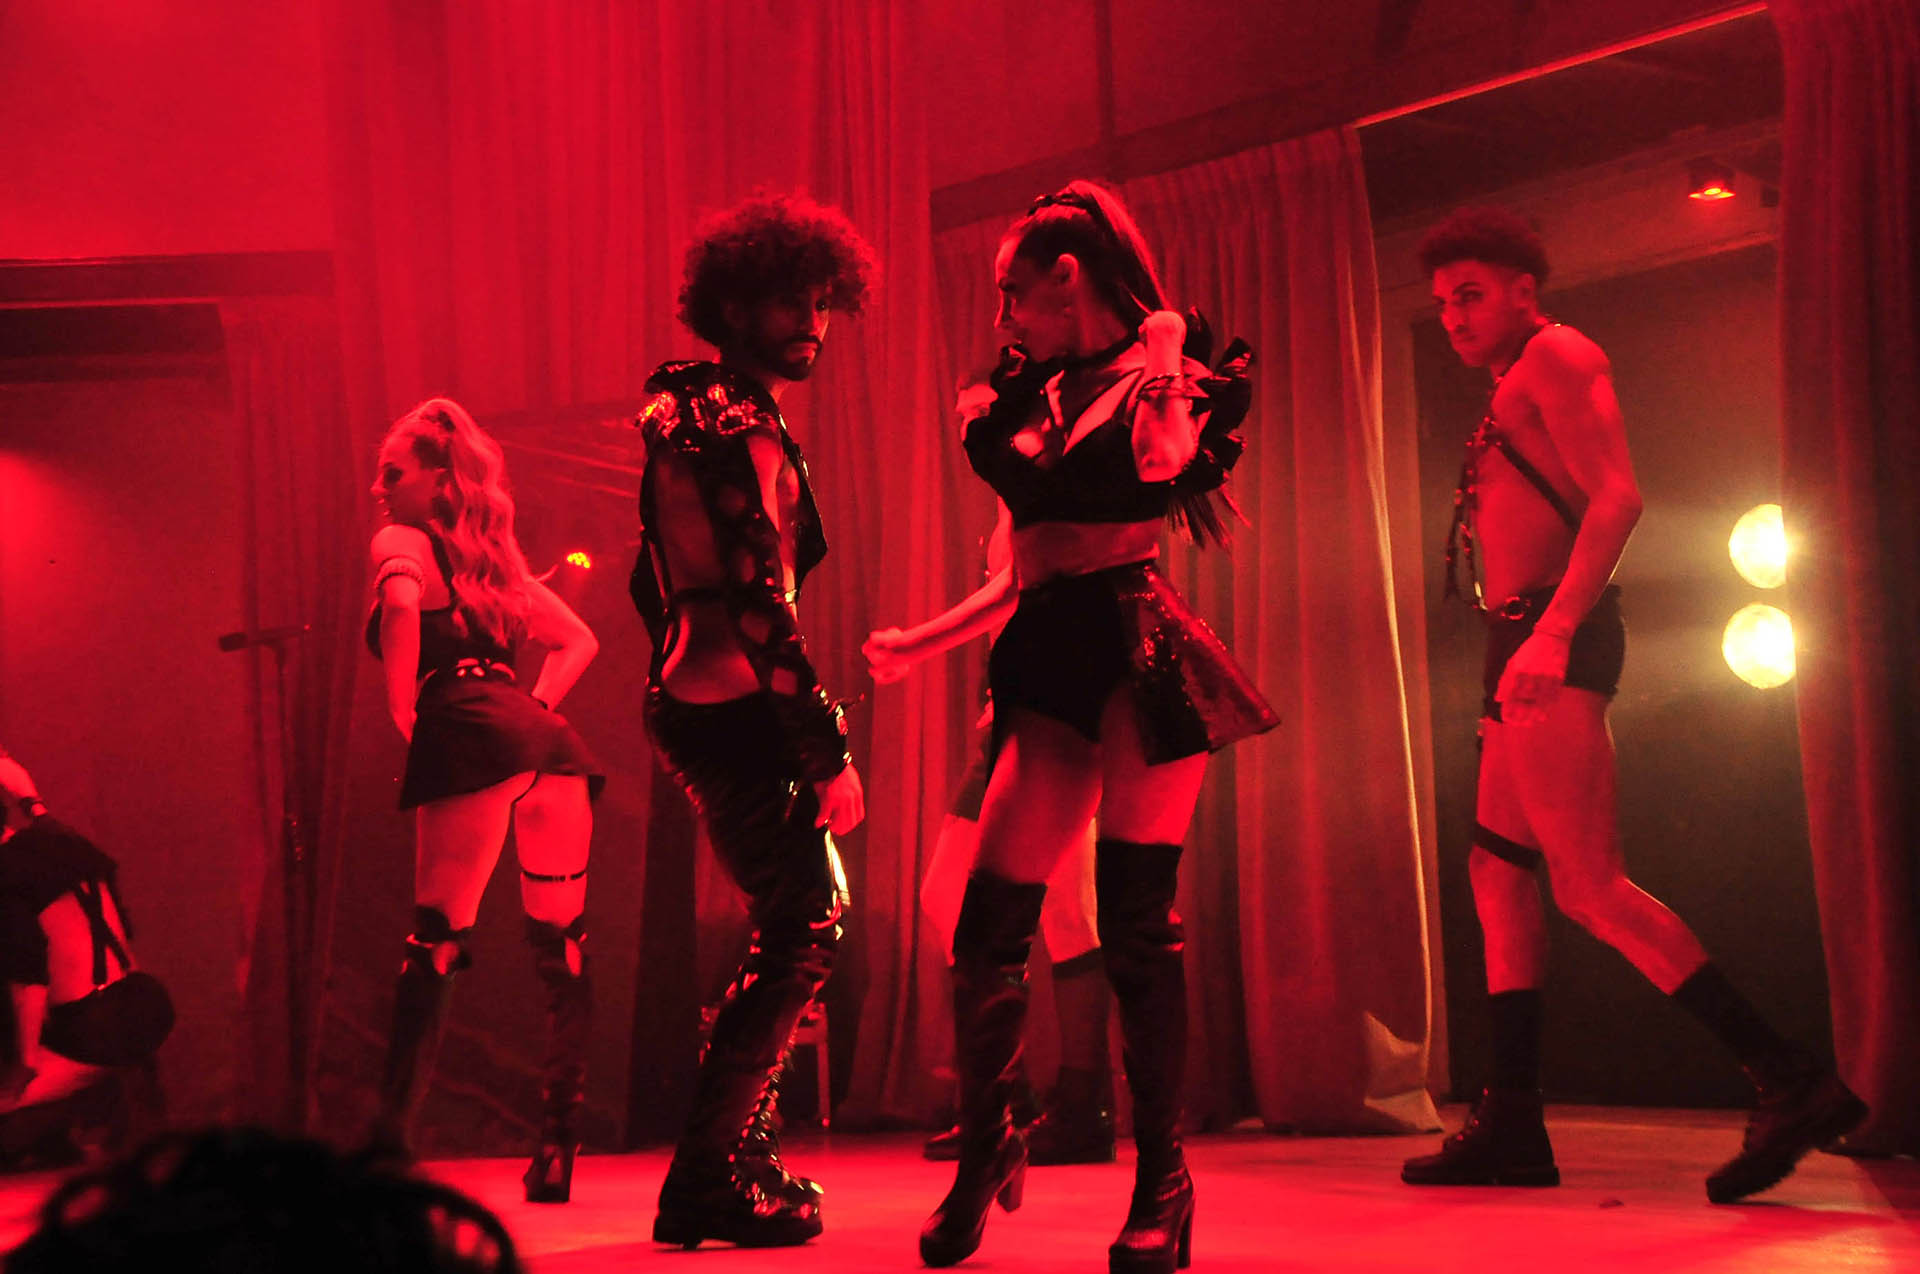 Las coreografías fueron creadas por Mati Napp